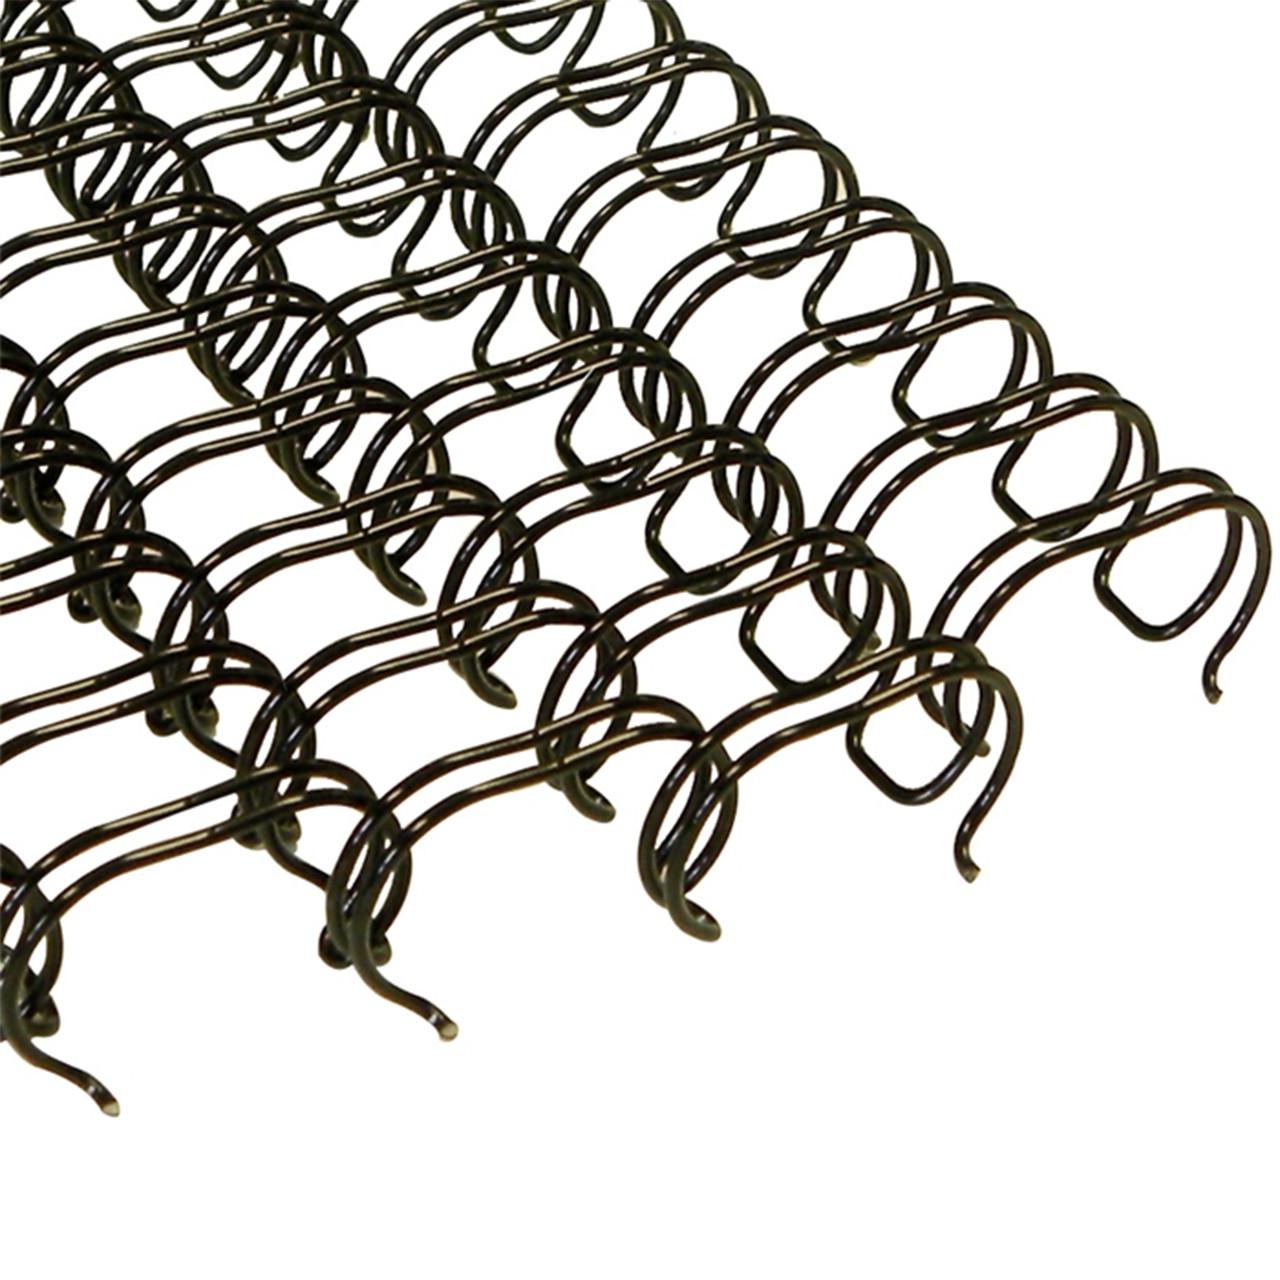 BindAply™ Double-Loop Wire - 3:1 Pitch - Black - Nobelus